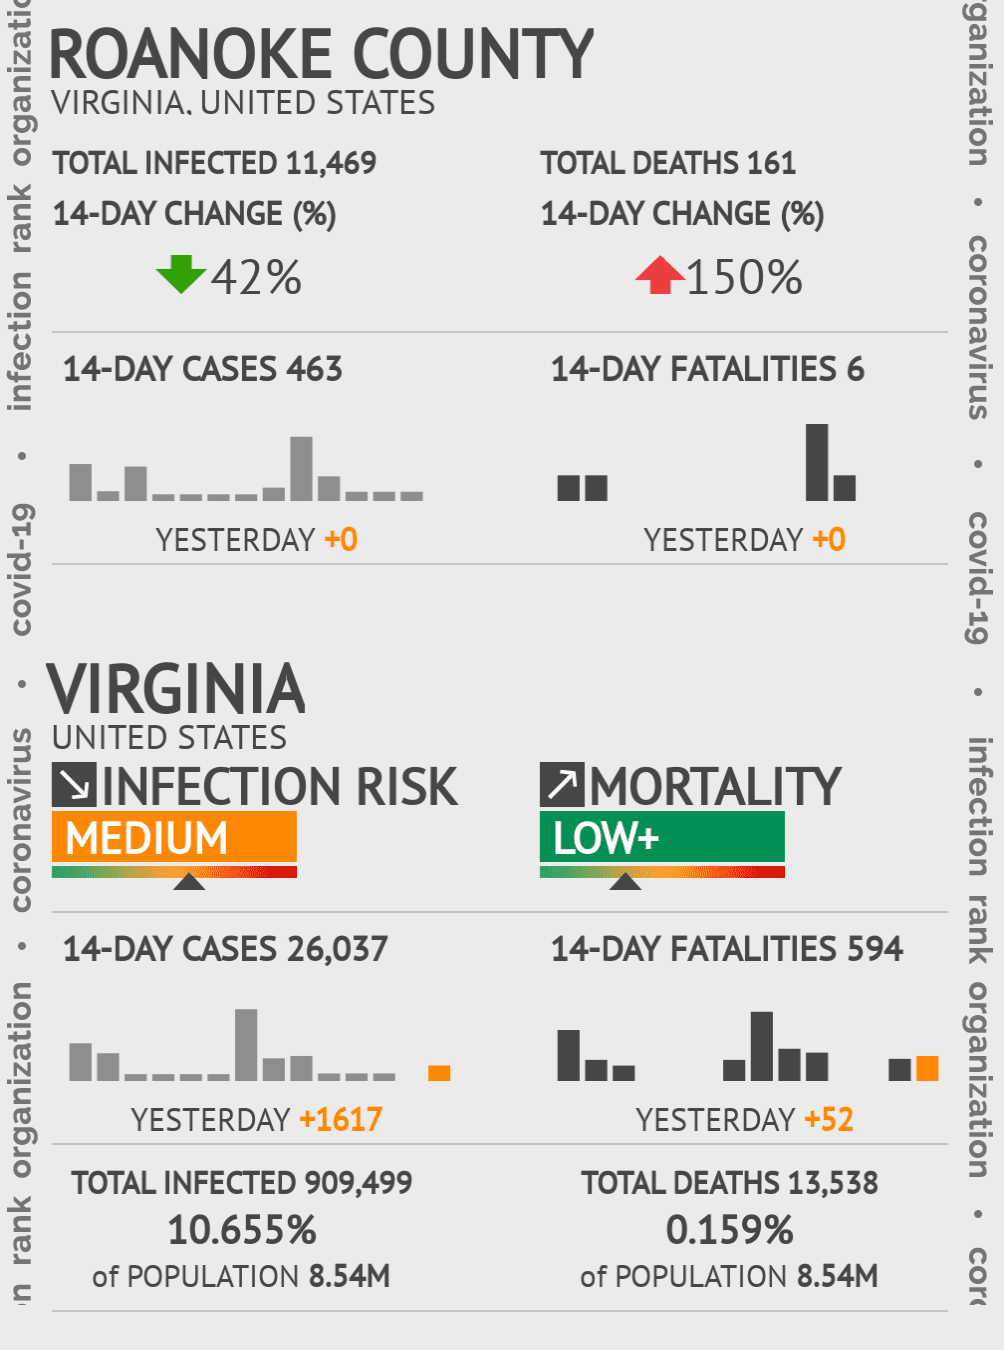 Roanoke County Coronavirus Covid-19 Risk of Infection on July 24, 2021